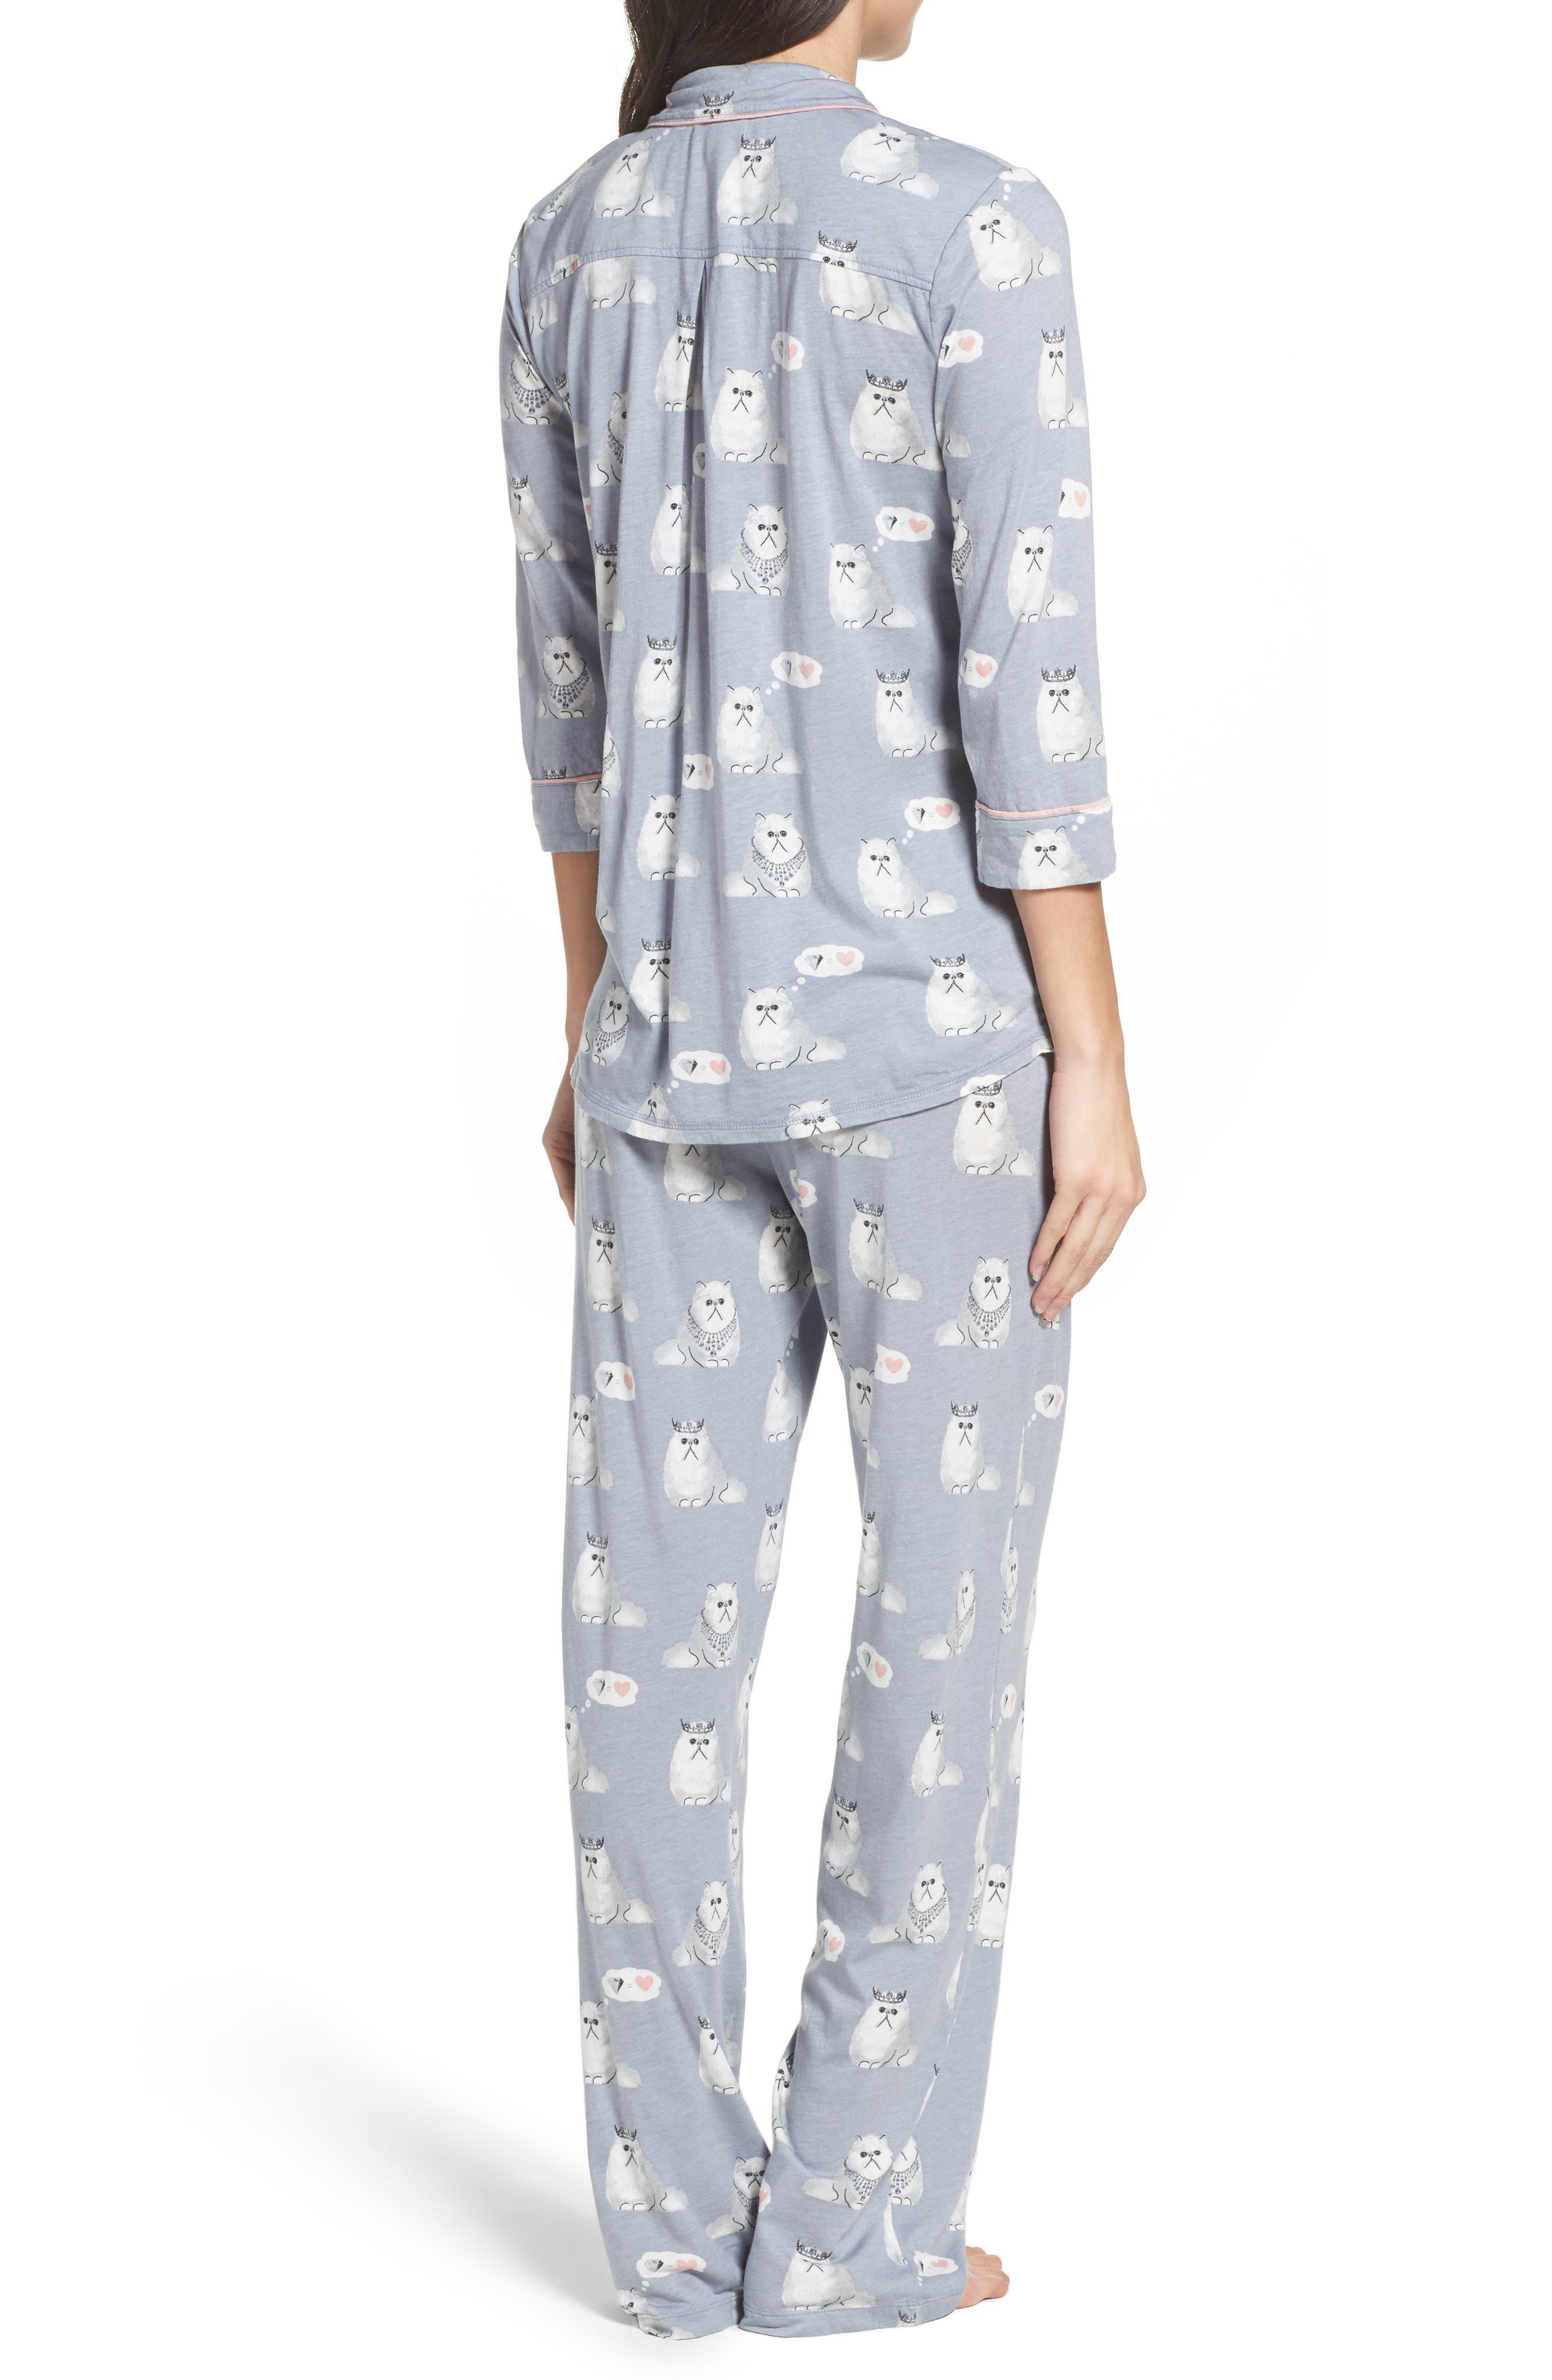 Playful Print Pajamas & Eye Mask,                             Alternate thumbnail 2, color,                             065